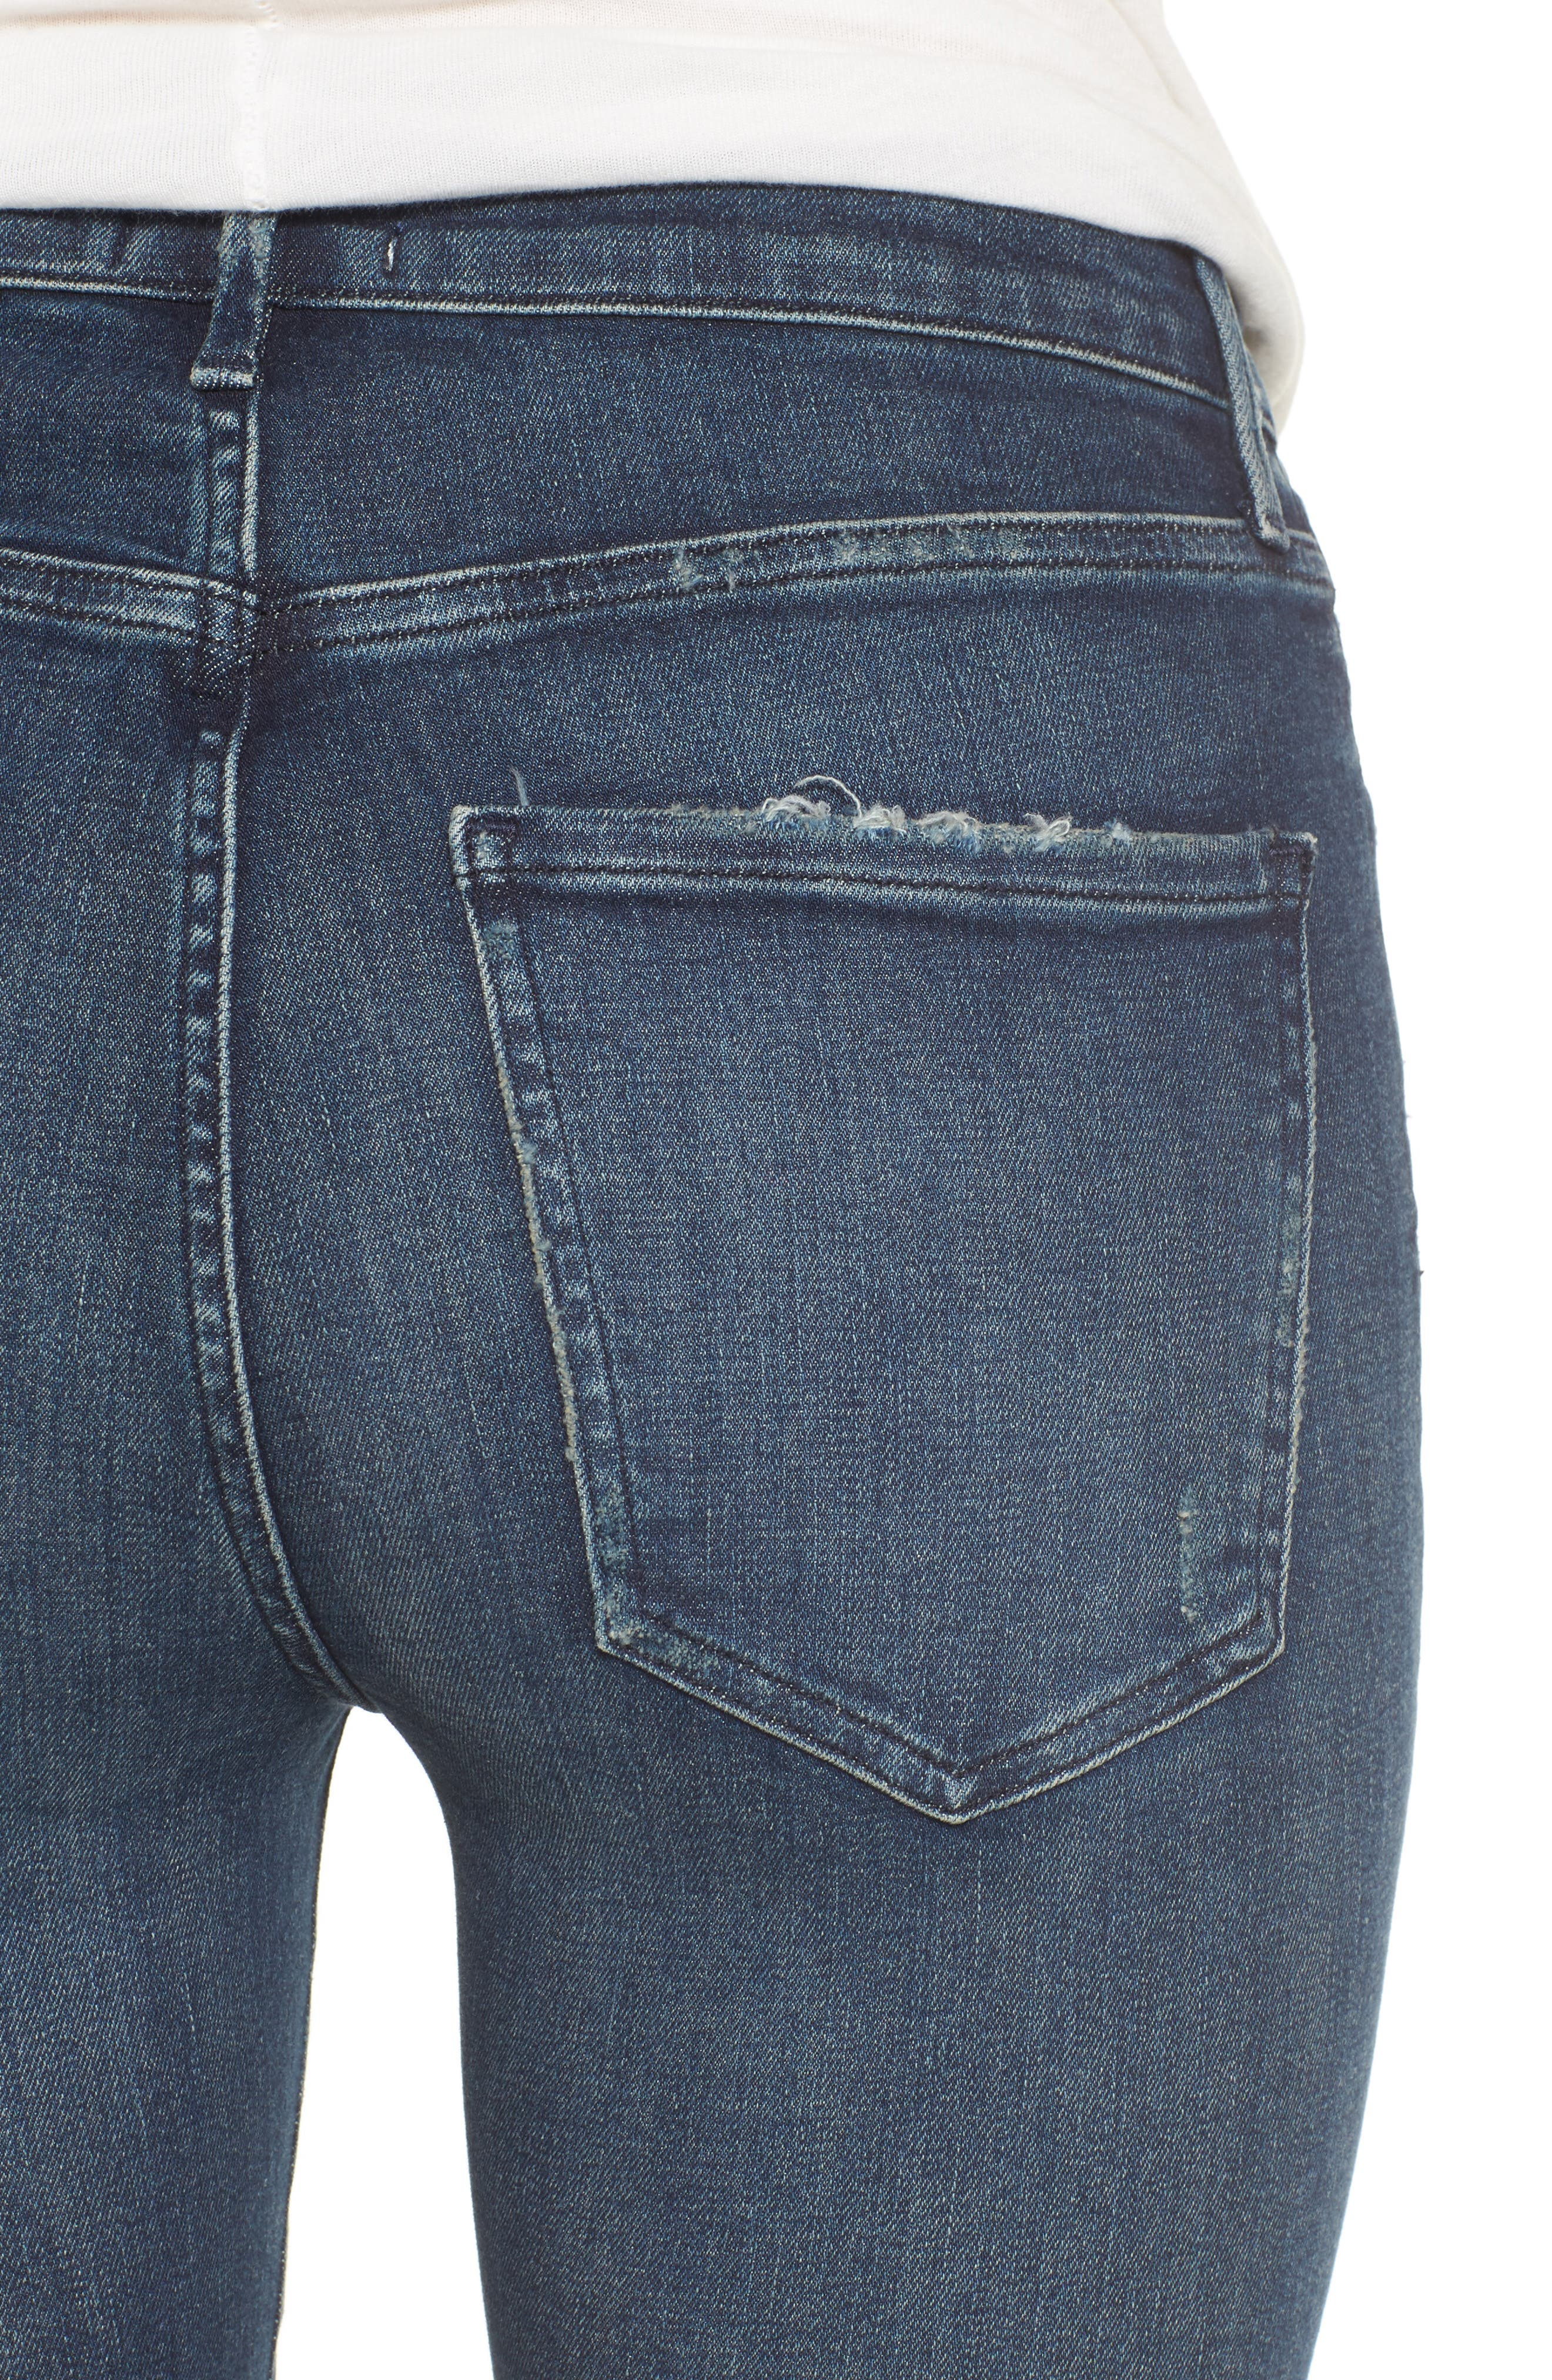 Sophie High Waist Skinny Jeans,                             Alternate thumbnail 8, color,